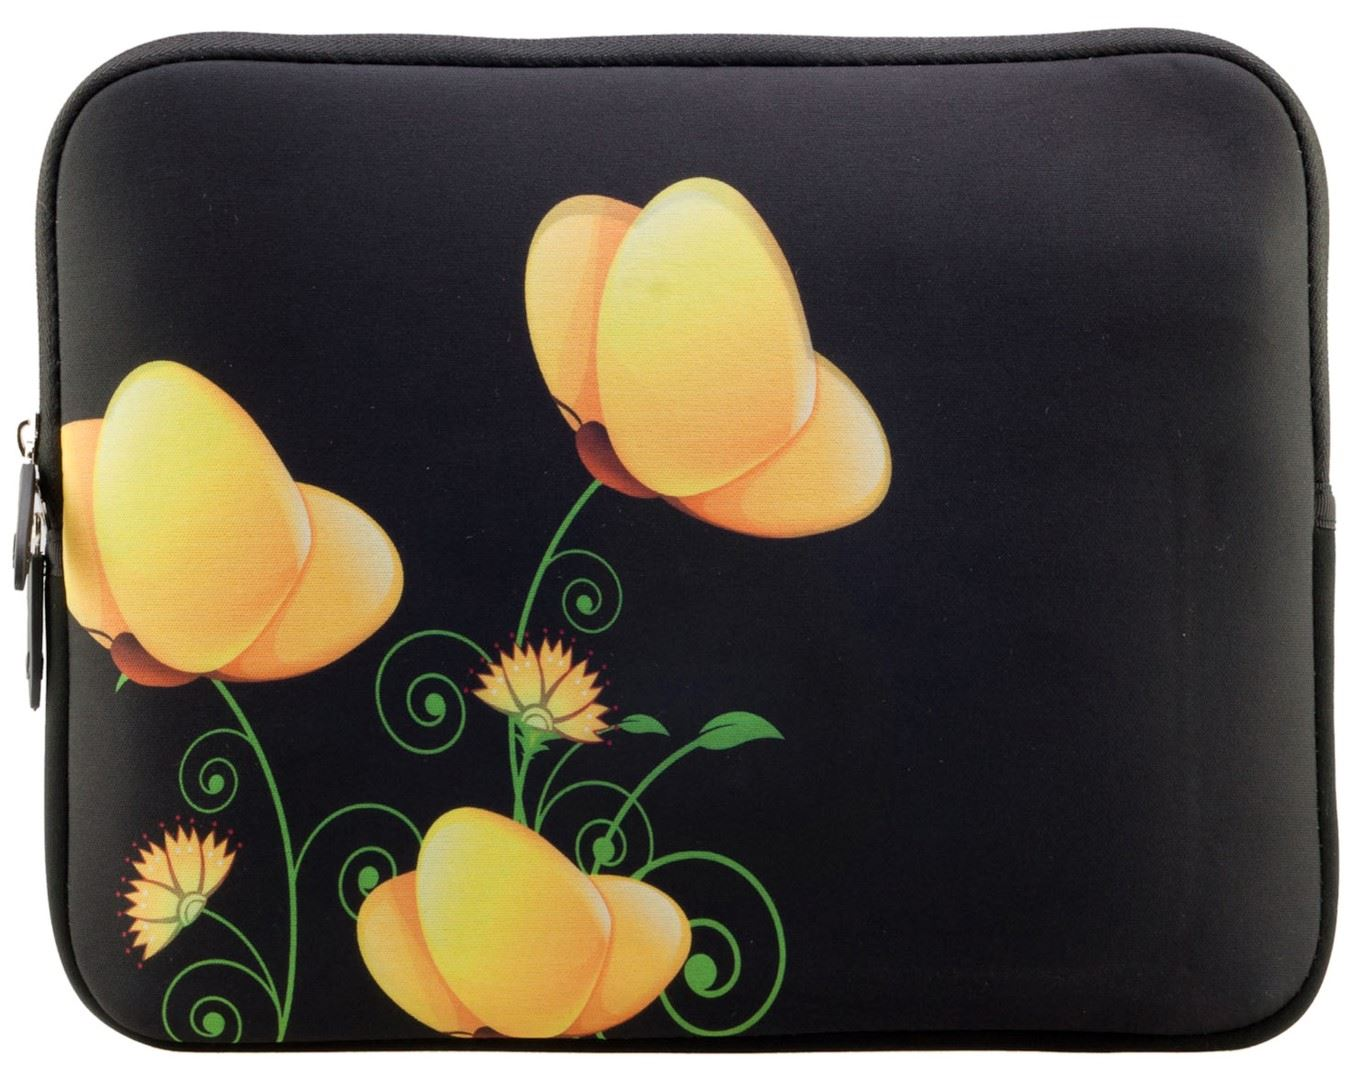 luxburg 7 9 zoll ipad mini aus neopren schutzh lle f r tablet 2 ebay. Black Bedroom Furniture Sets. Home Design Ideas